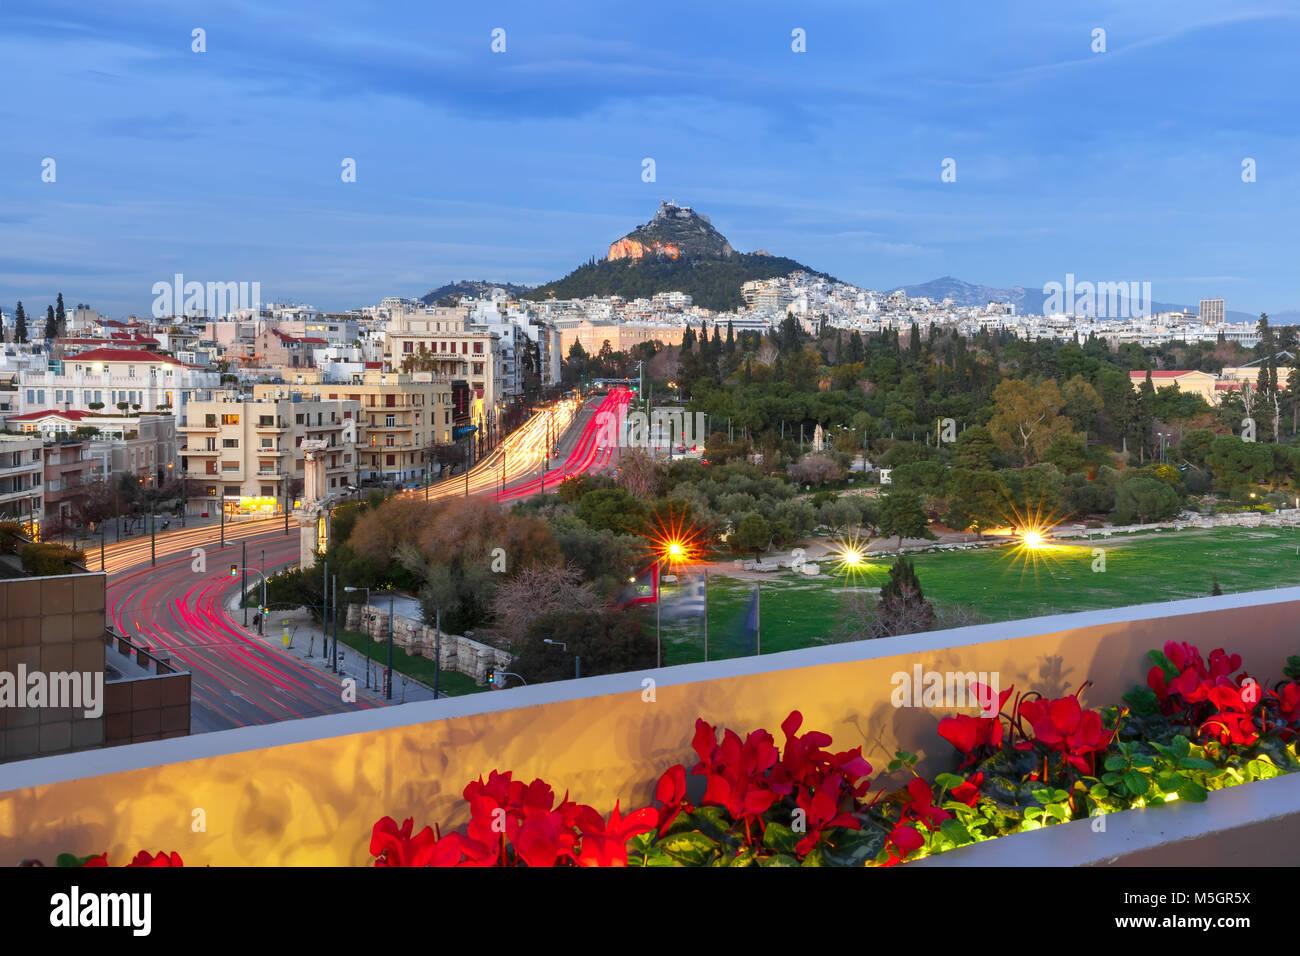 Mount Lycabettus in Athens, Greece Stock Photo